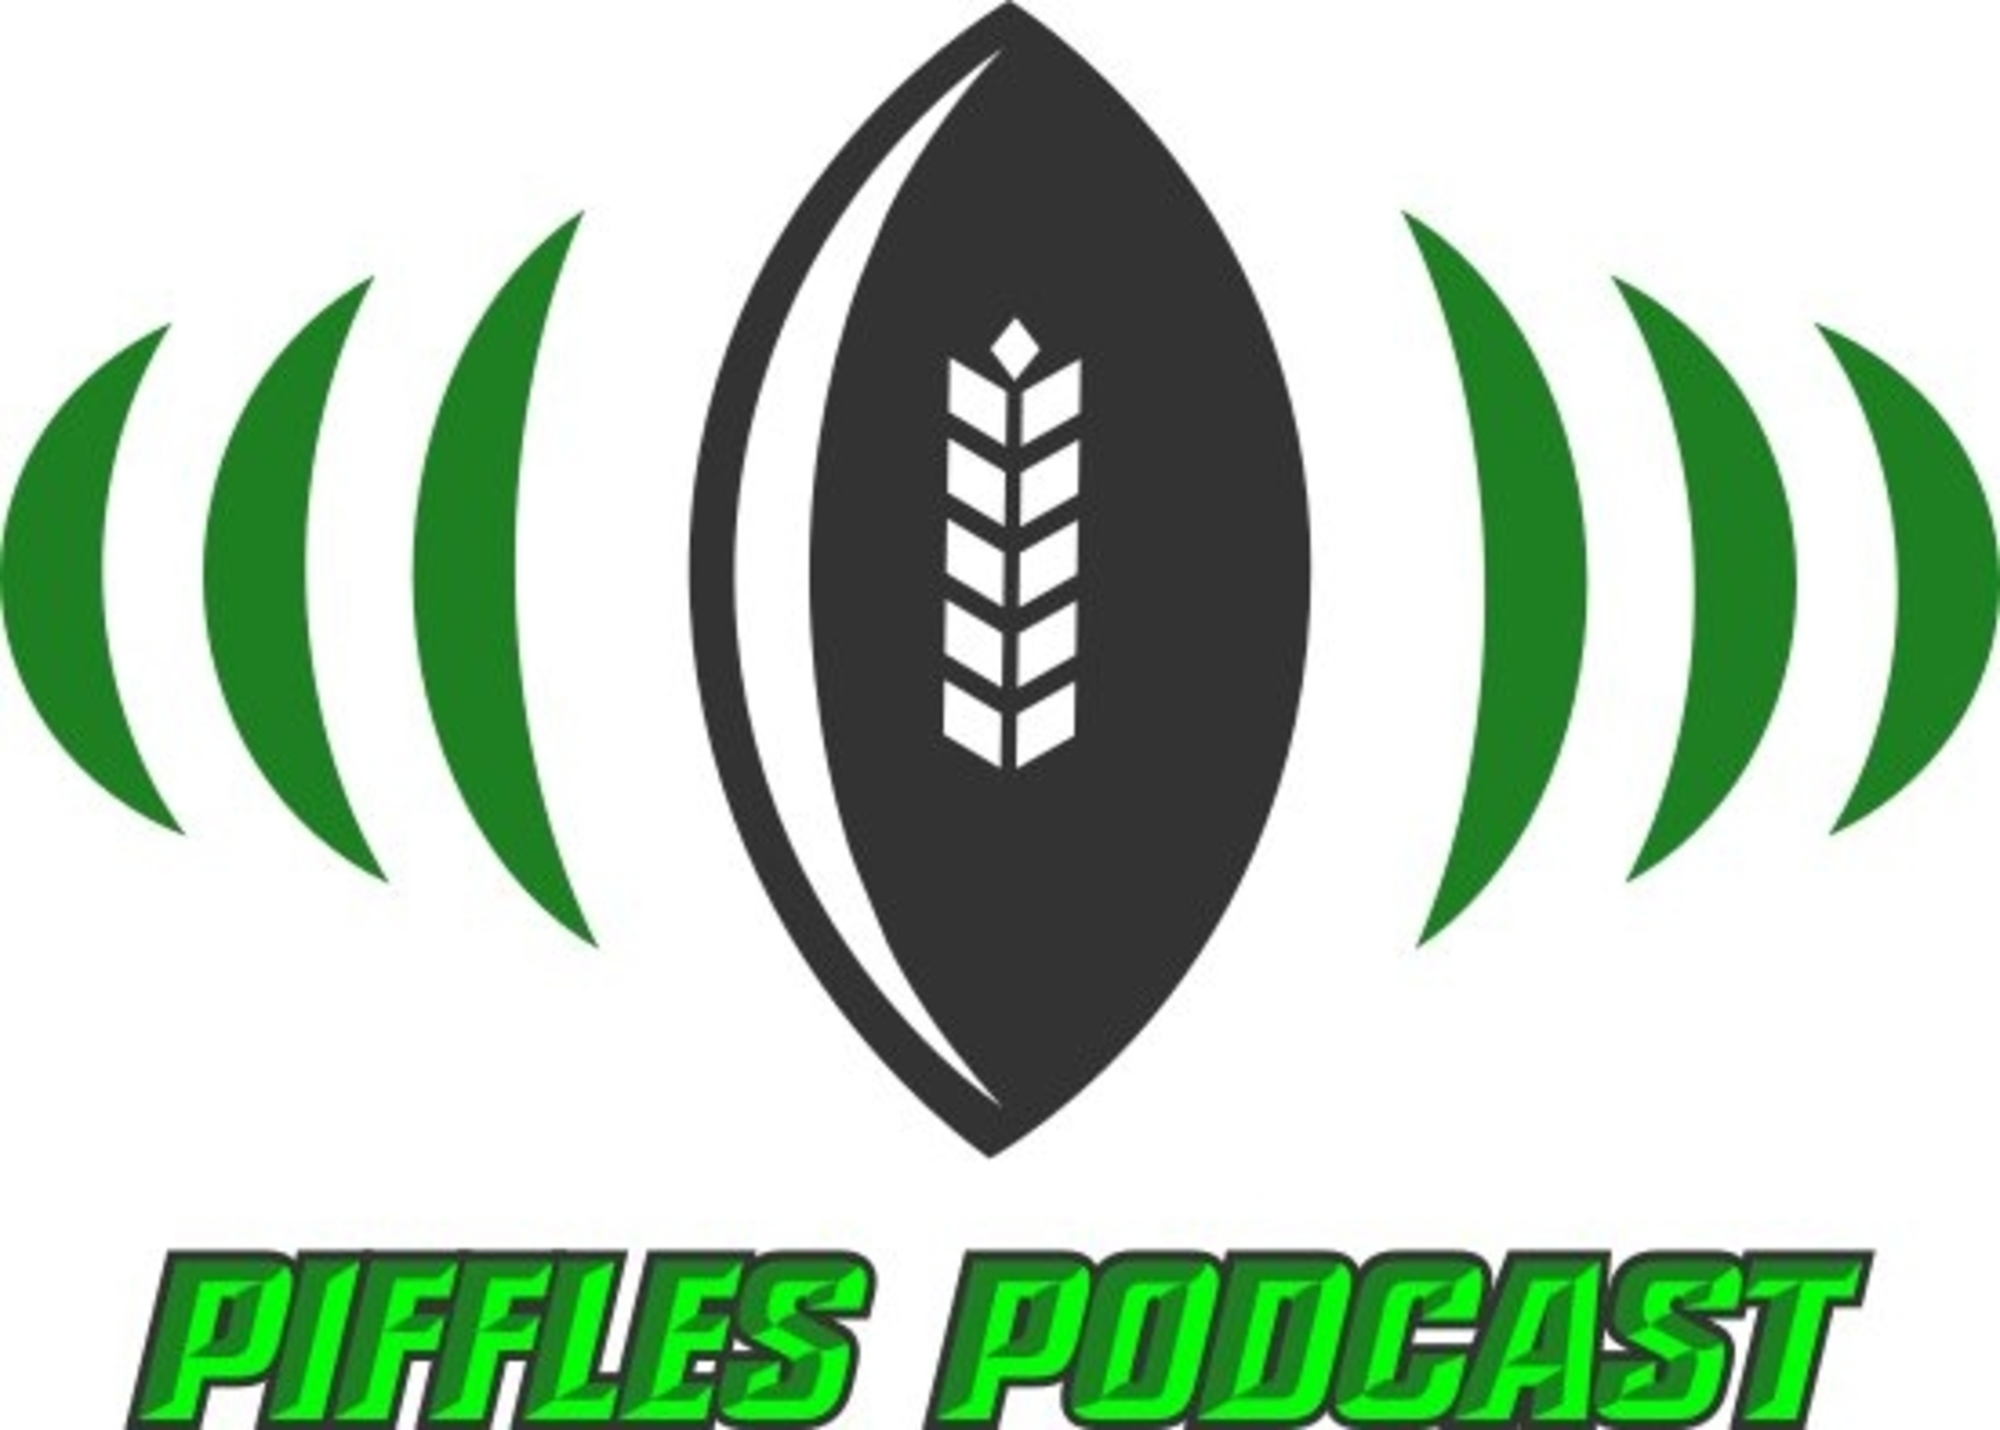 Piffles Podcast Episode 74 - CFL Draft Recap & Ottawa REDBLACKS Greg Ellingson